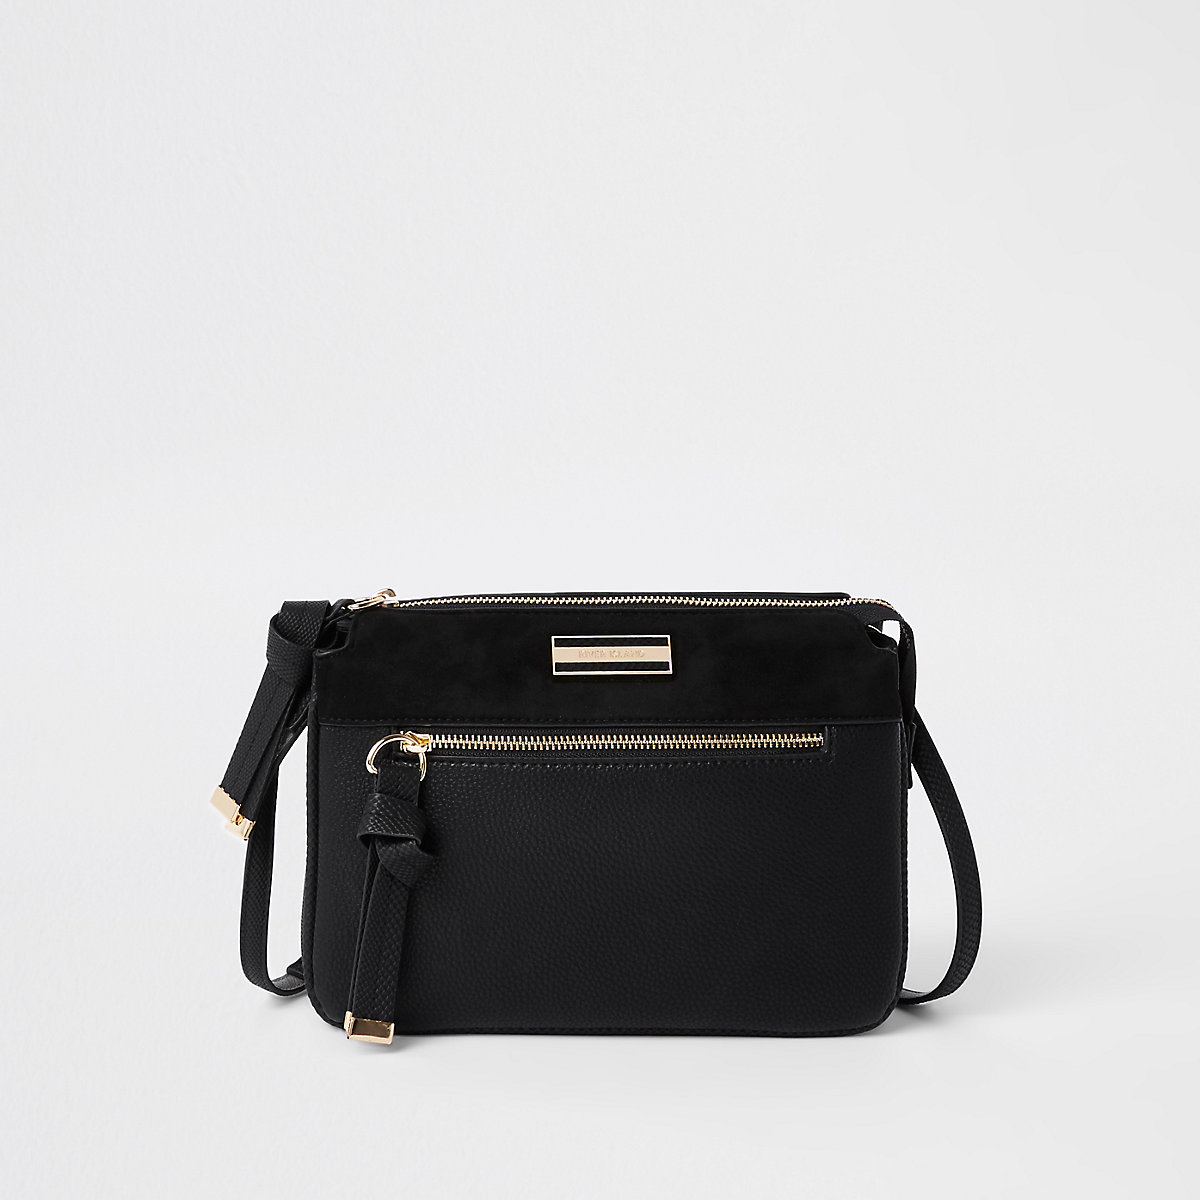 Black triple compartment crossbody bag